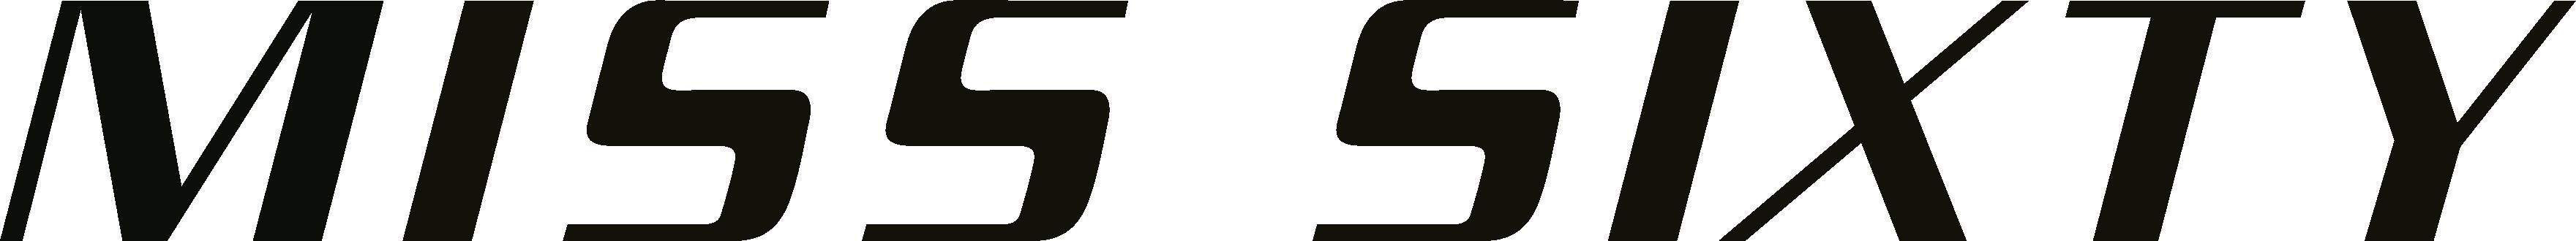 https://bbt.org.ua/wp-content/uploads/2020/07/miss_sixty-logo.png